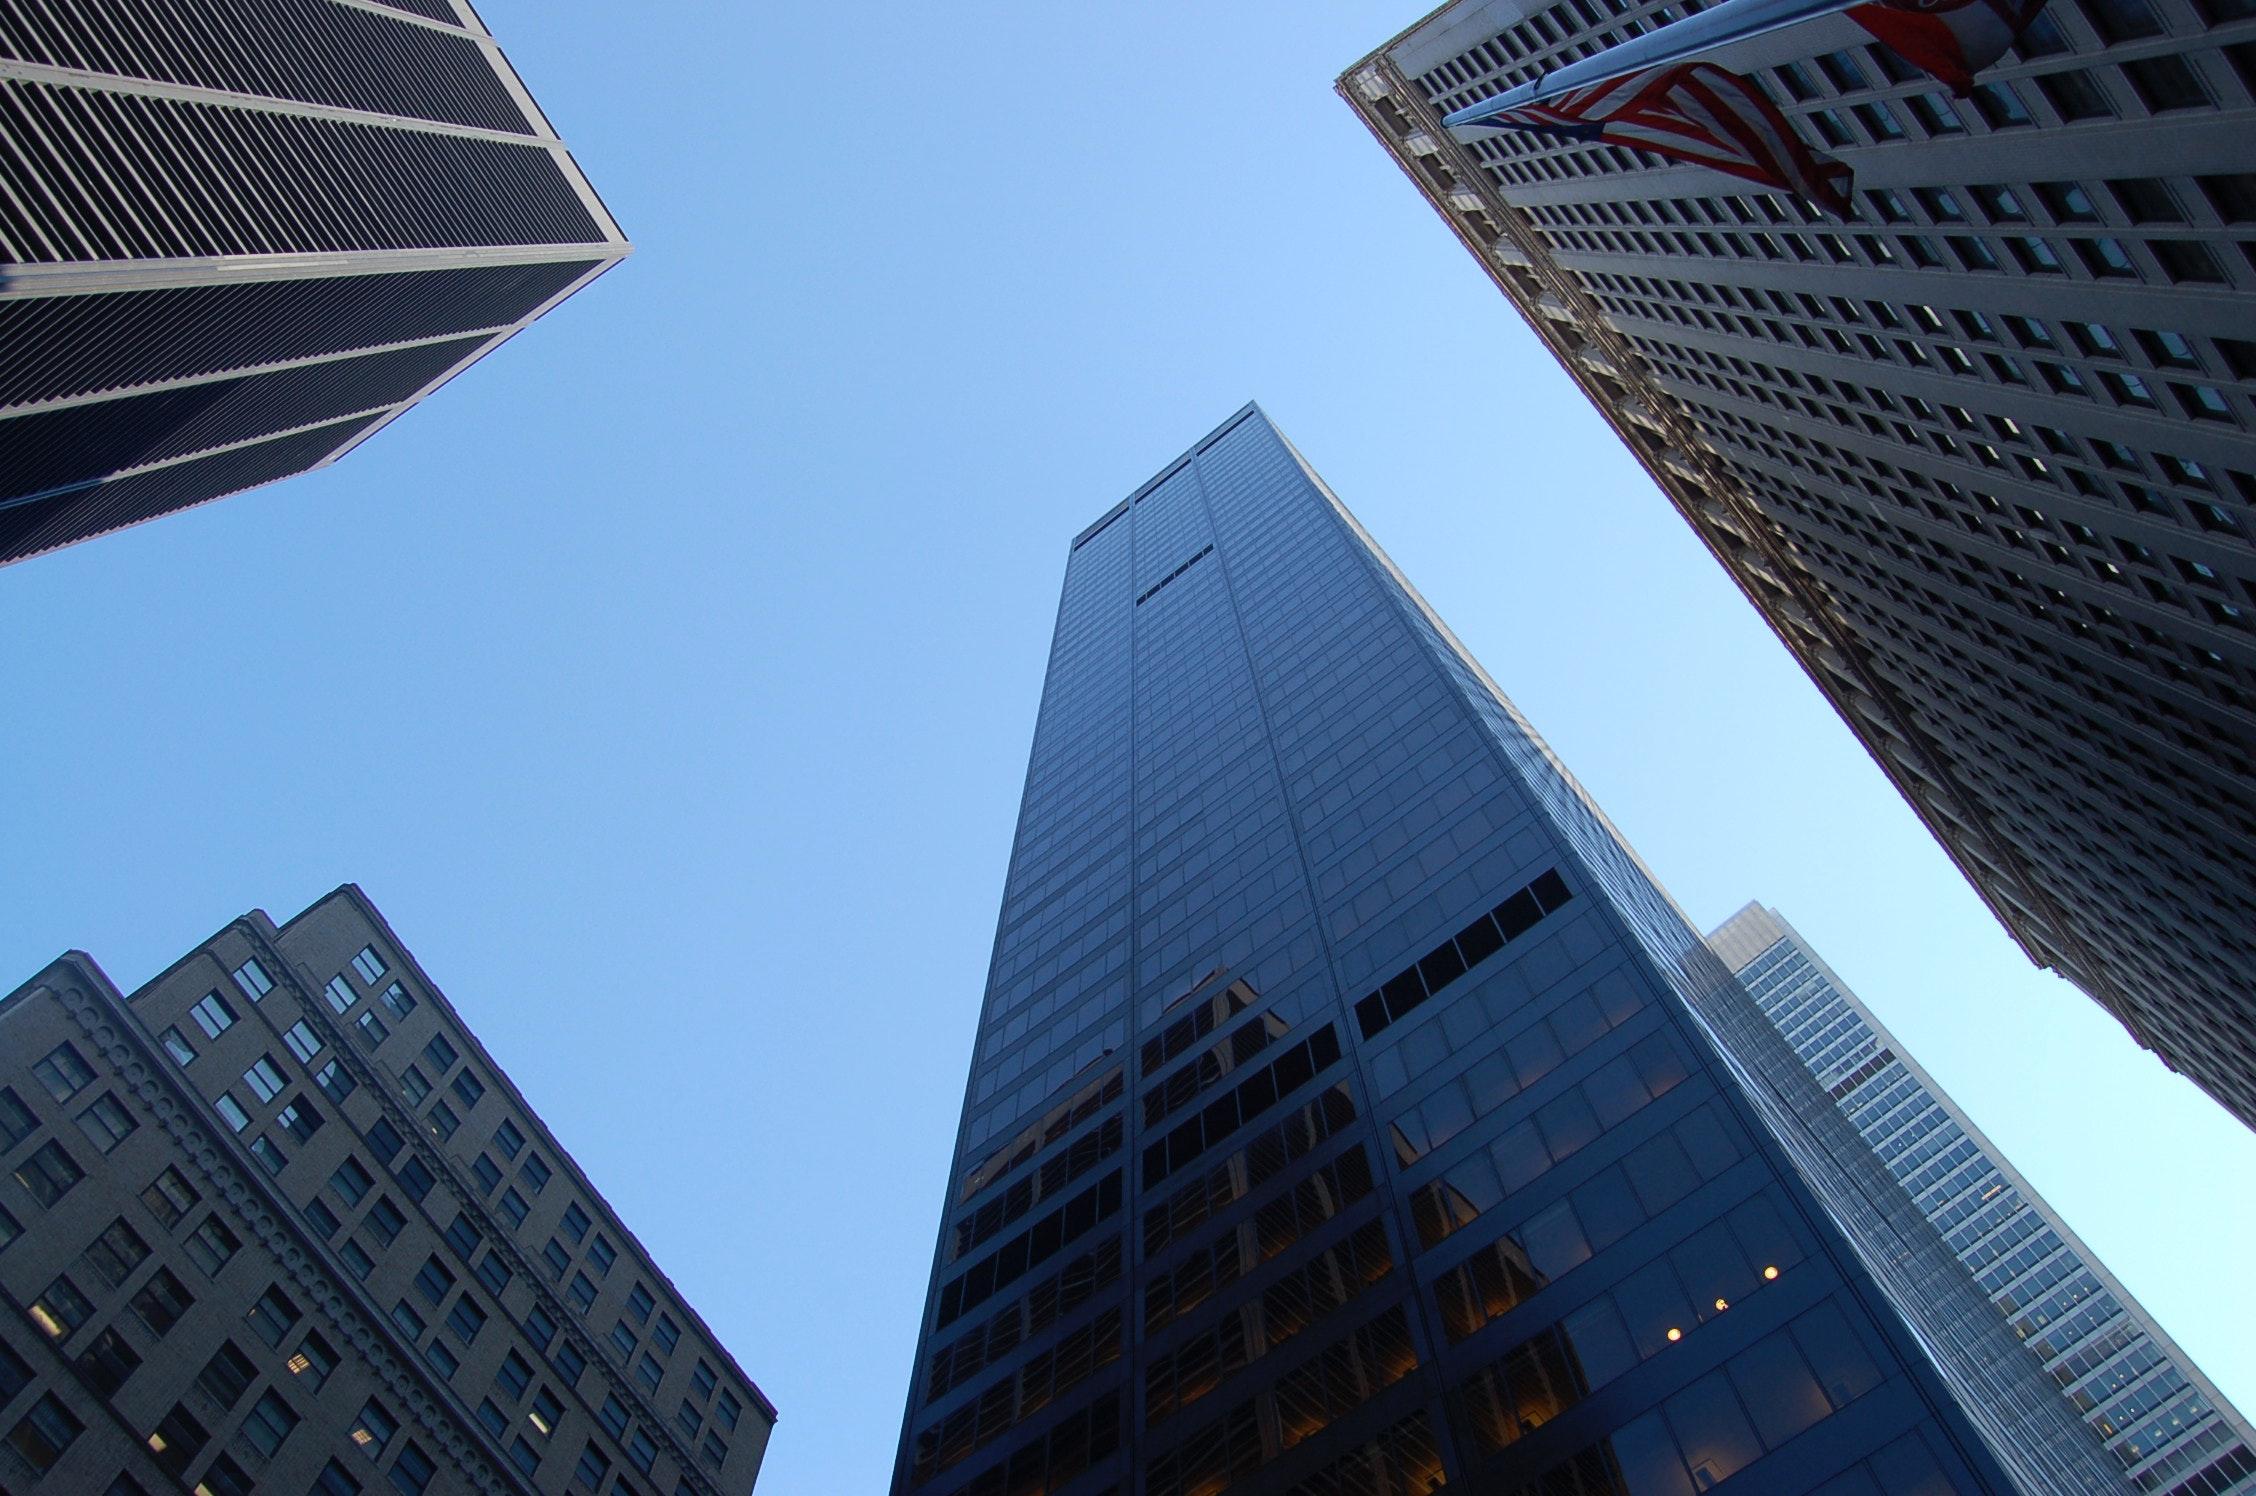 architectural-design-architecture-blue-sky-364388.jpg